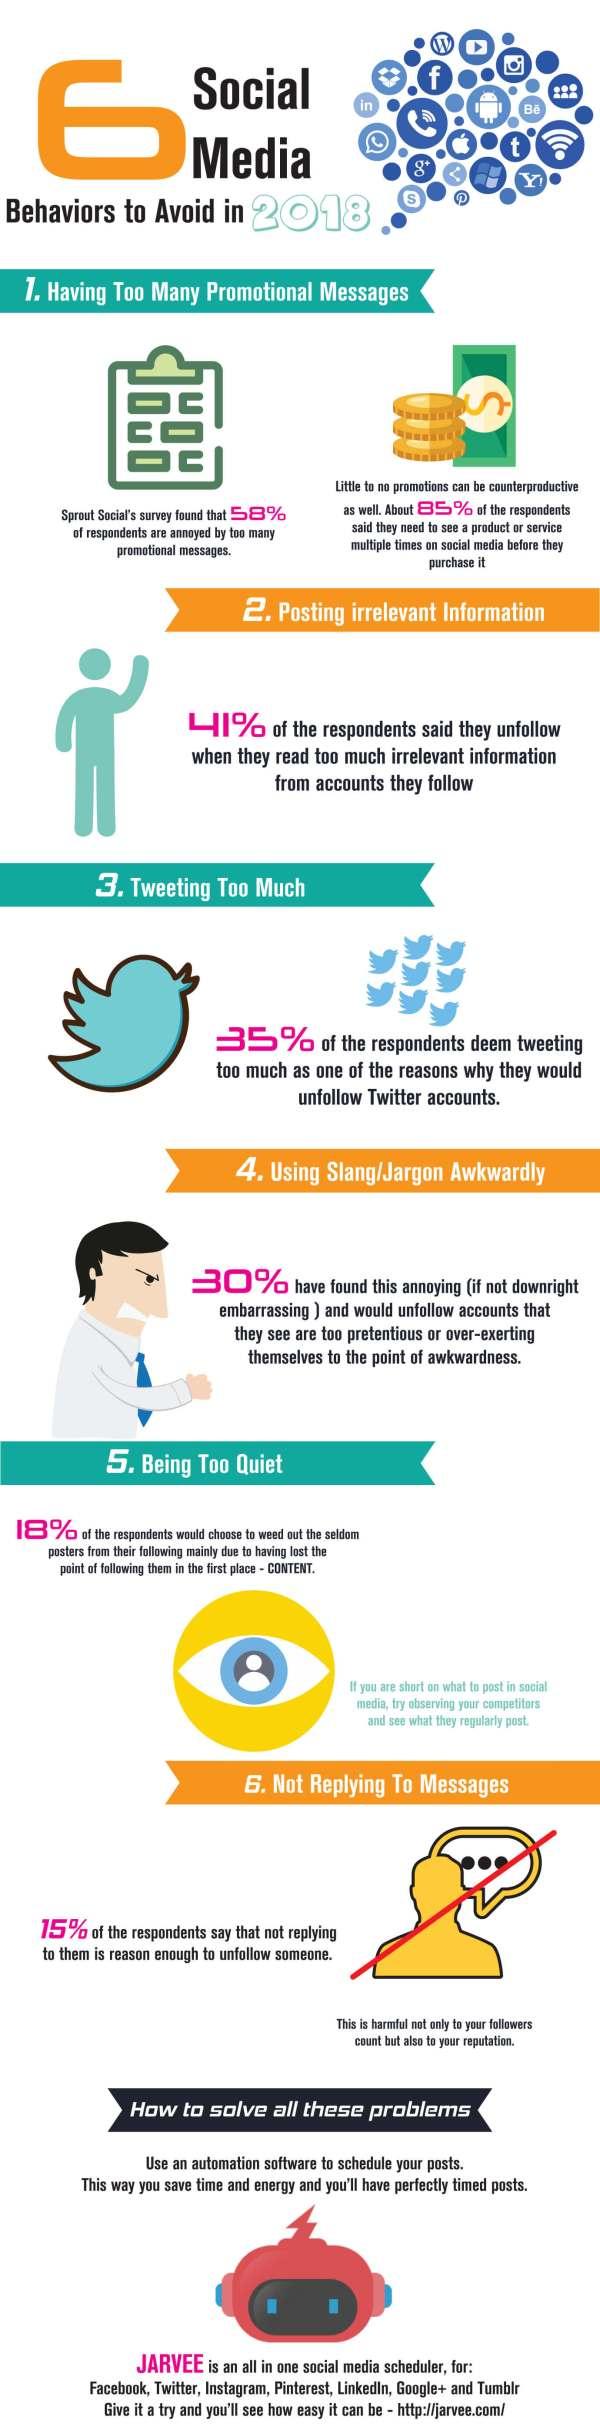 6 Social Media Behaviors To Avoid In 2018